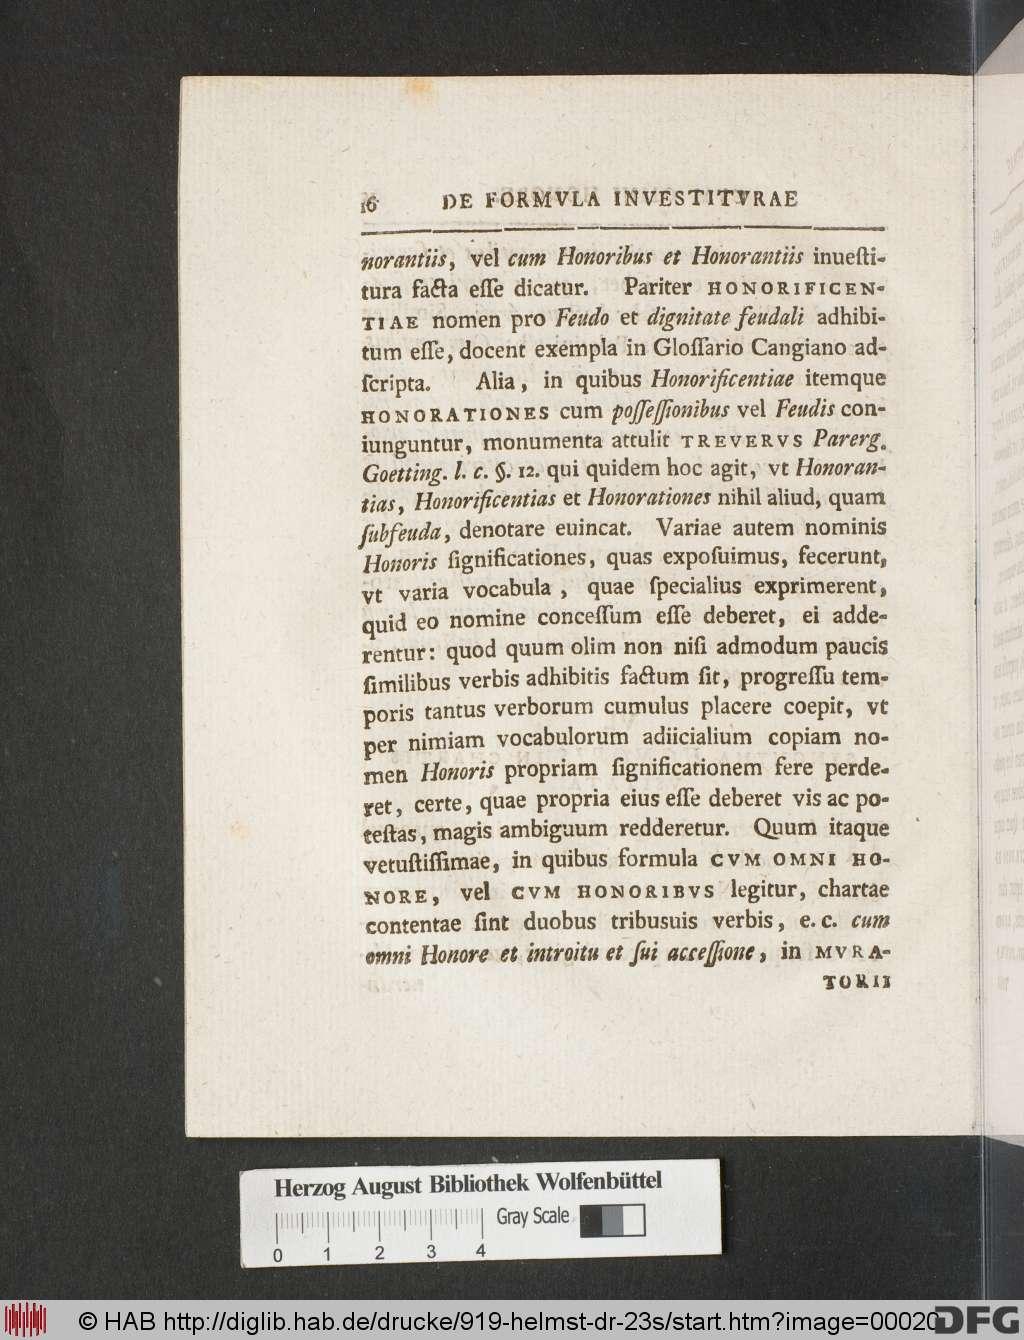 https://diglib.hab.de/drucke/919-helmst-dr-23s/00020.jpg